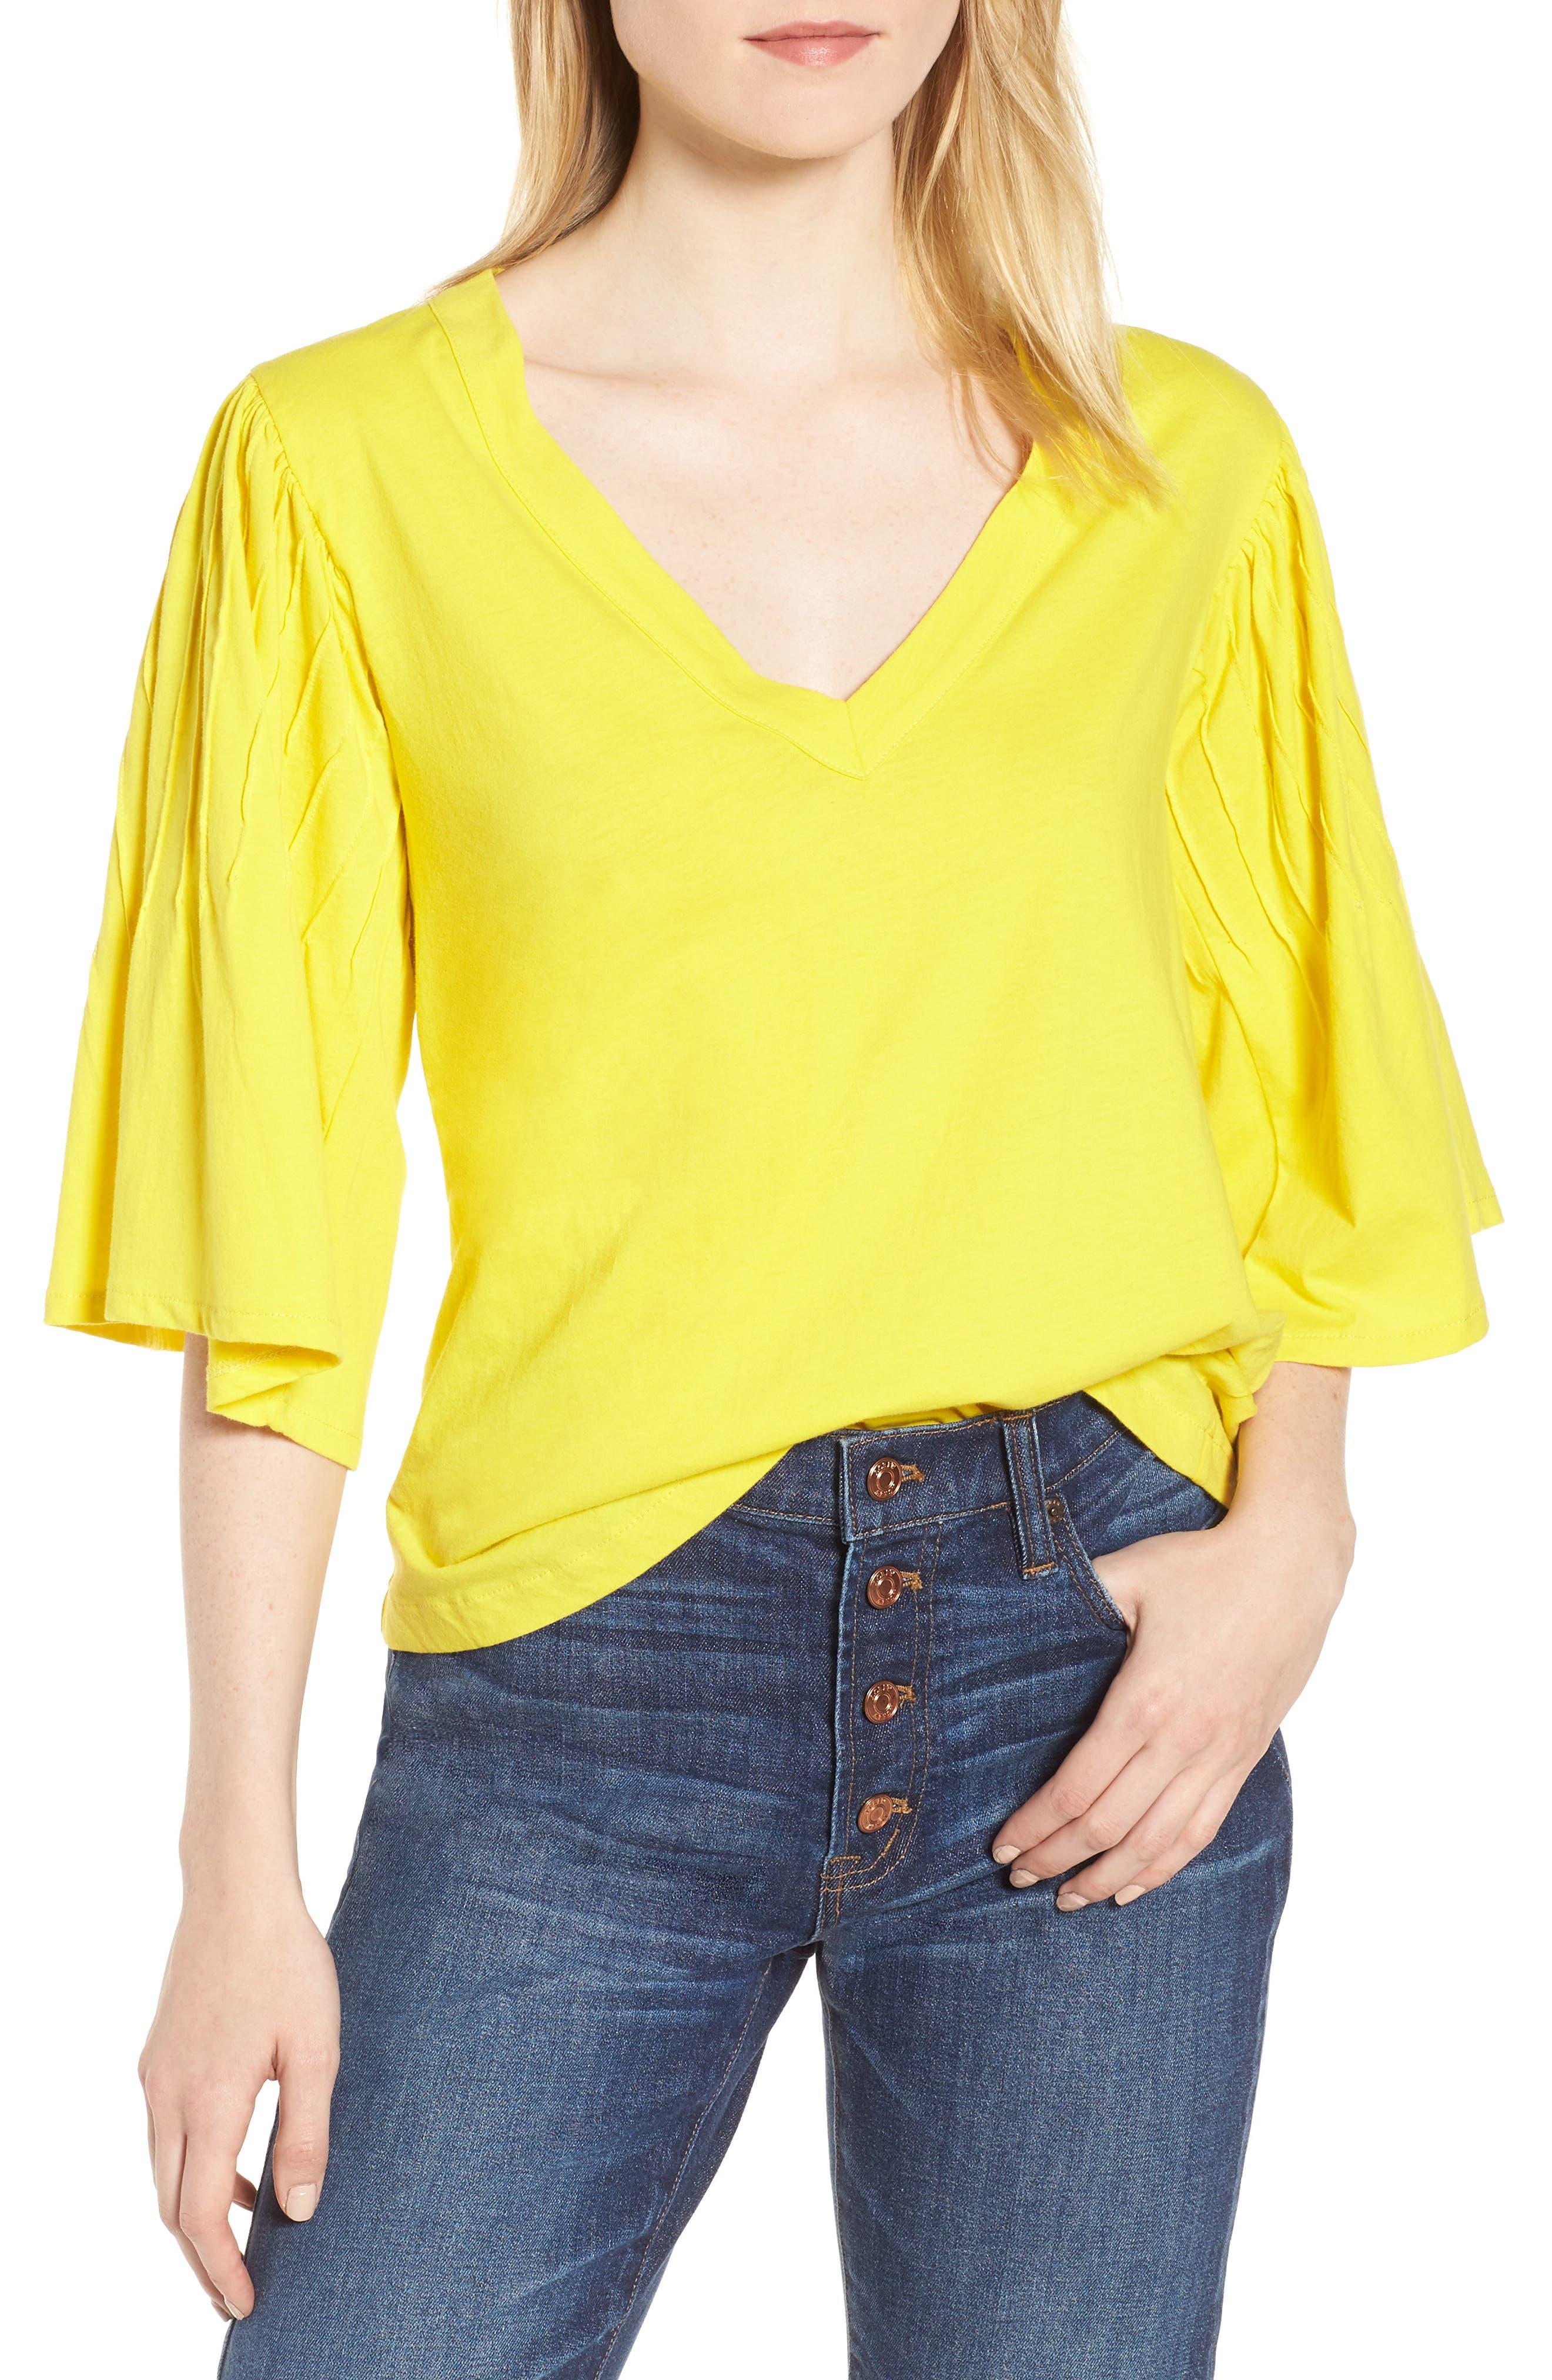 J.Crew Pintuck Sleeve Cotton Blouse,                         Main,                         color, Vivid Canary